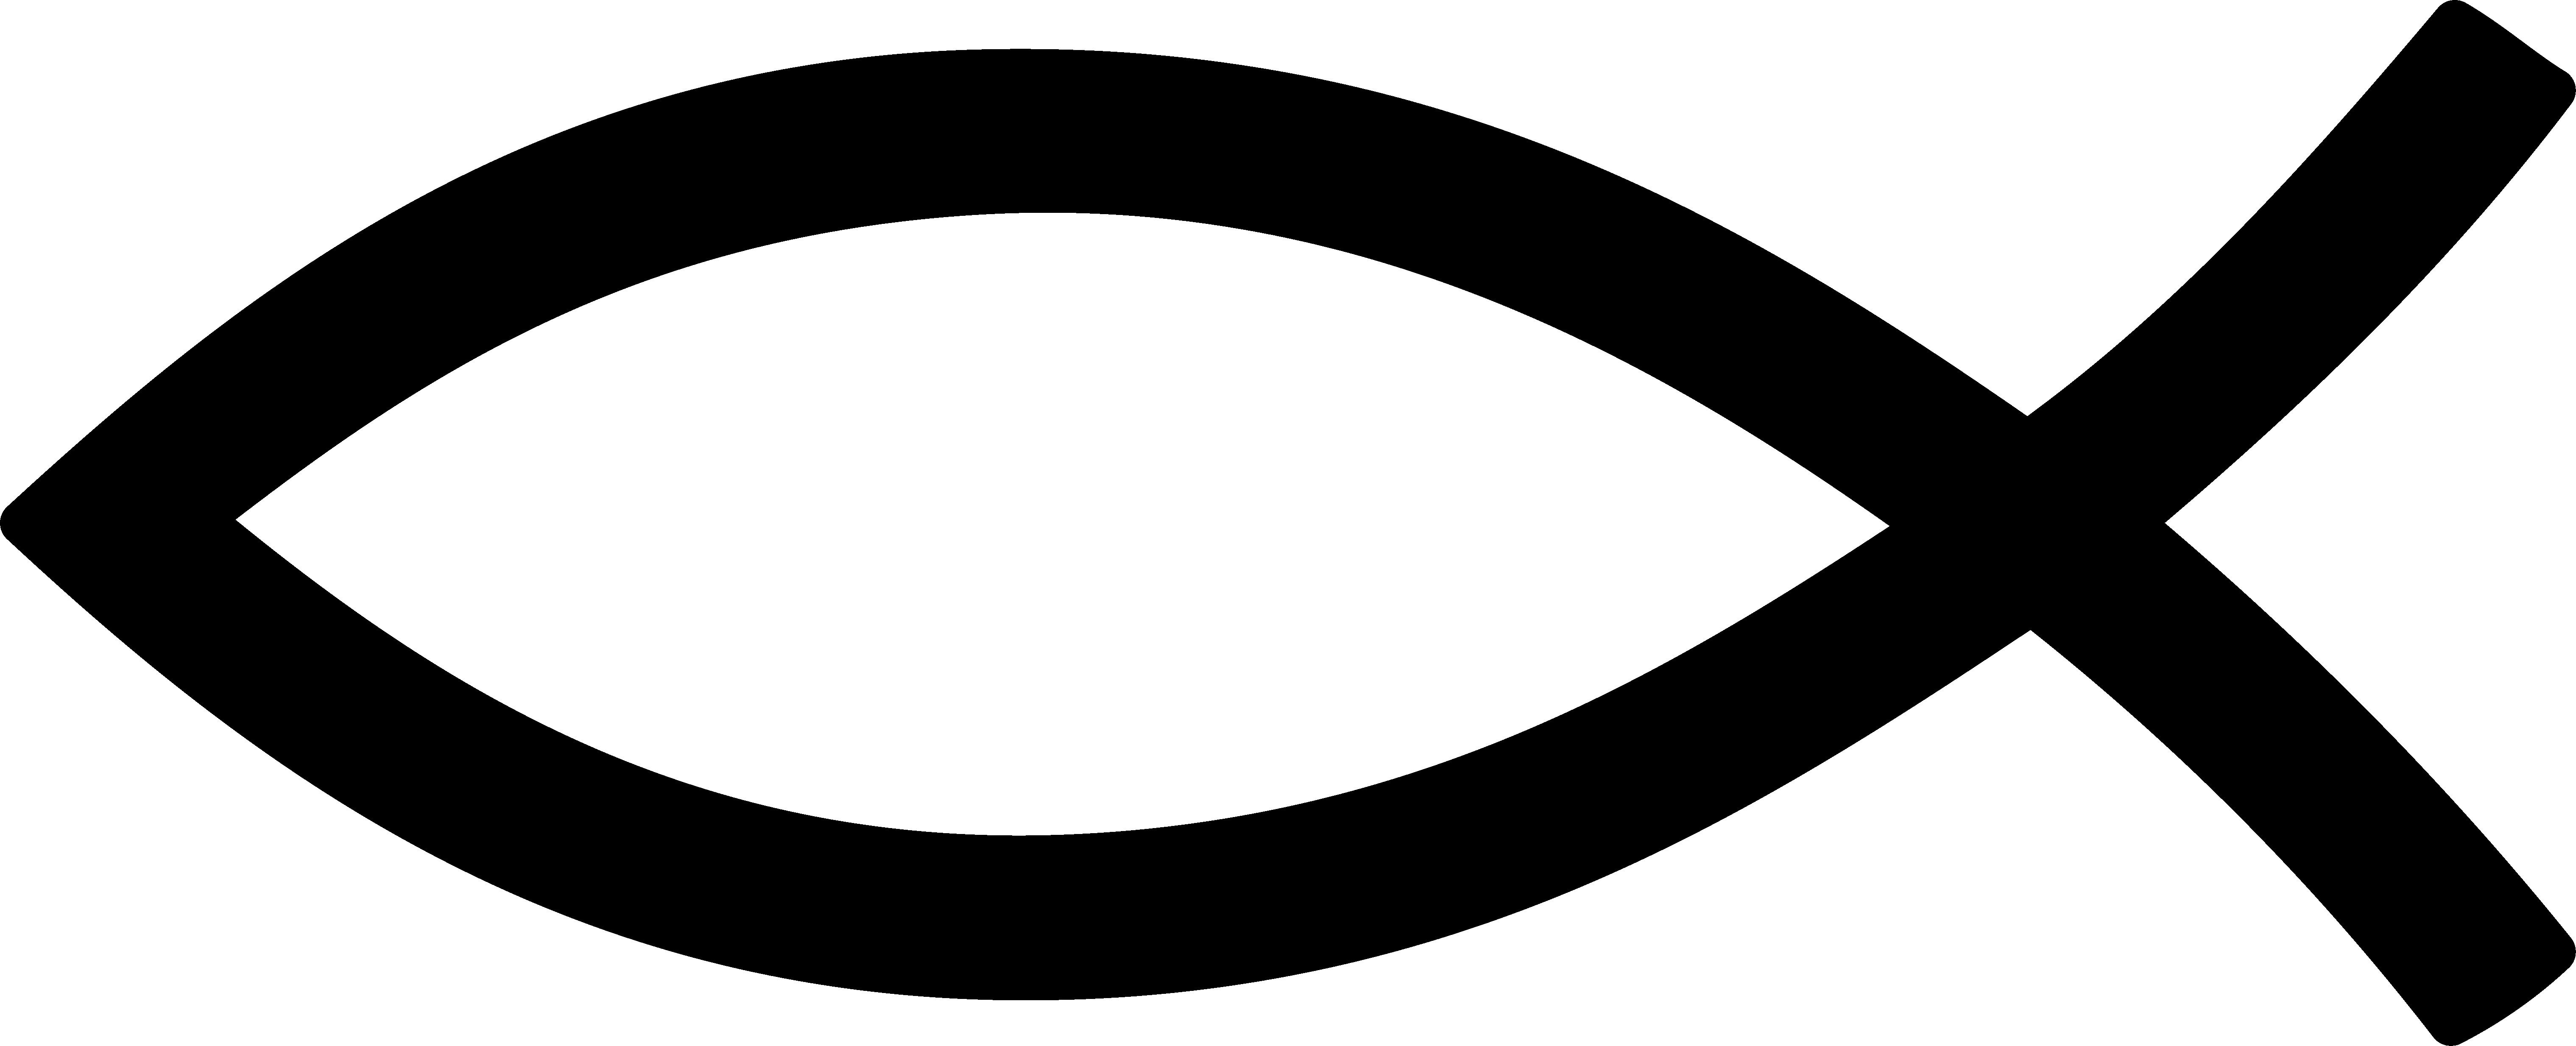 Ichthys Christian Fish Symbol - Free Clip Art